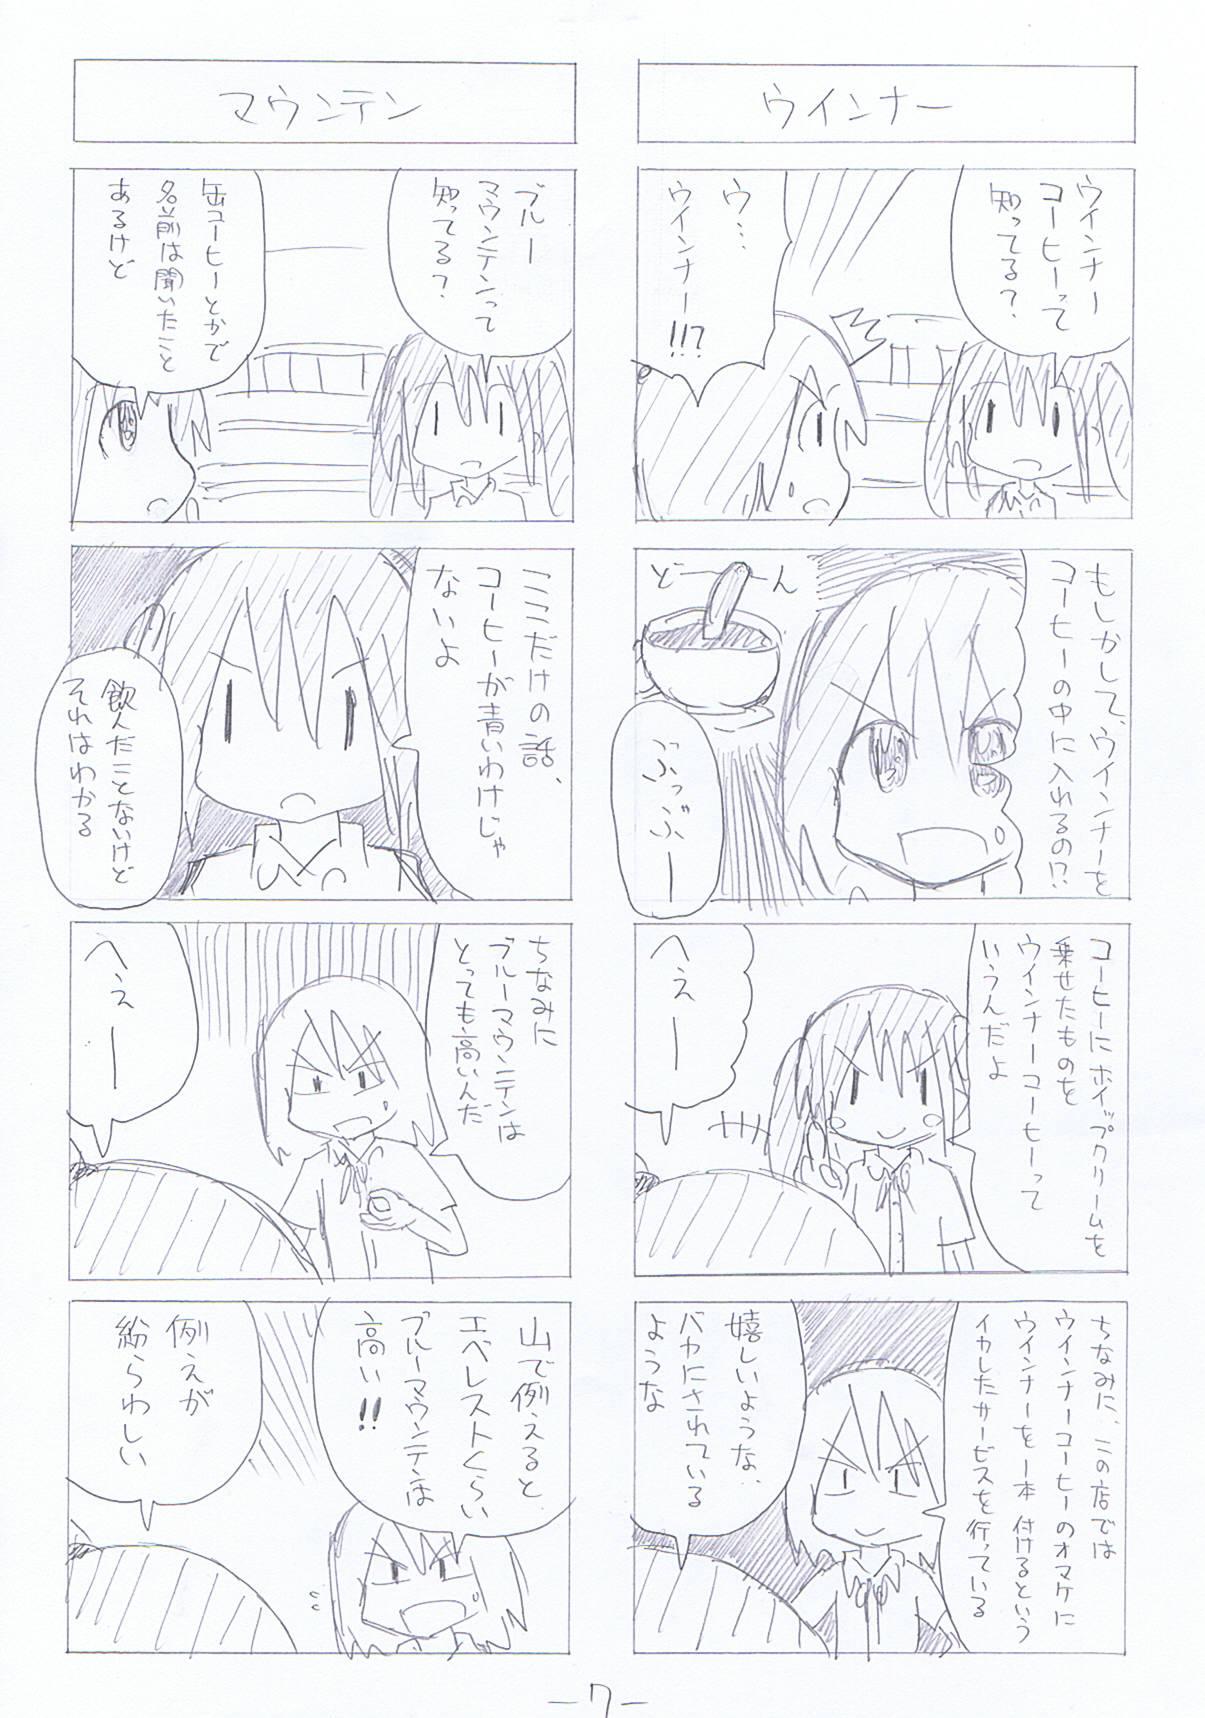 hitotoki-2-7.jpg